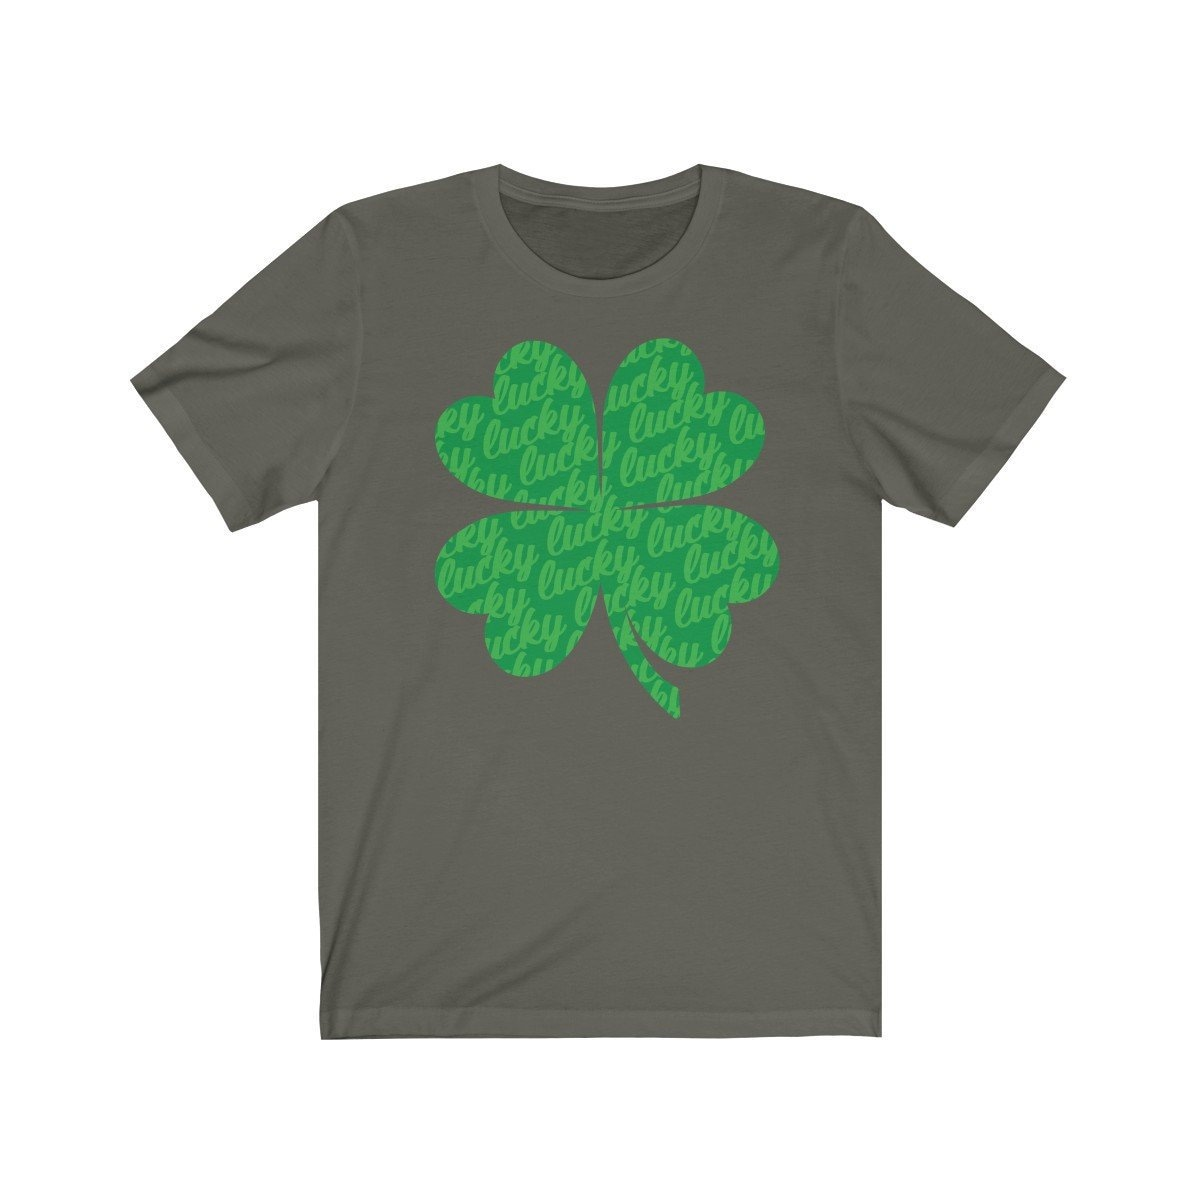 361fa43f4 Fun St Patricks Day Shirt Lucky T-shirt Gift For Irish Men or | Etsy